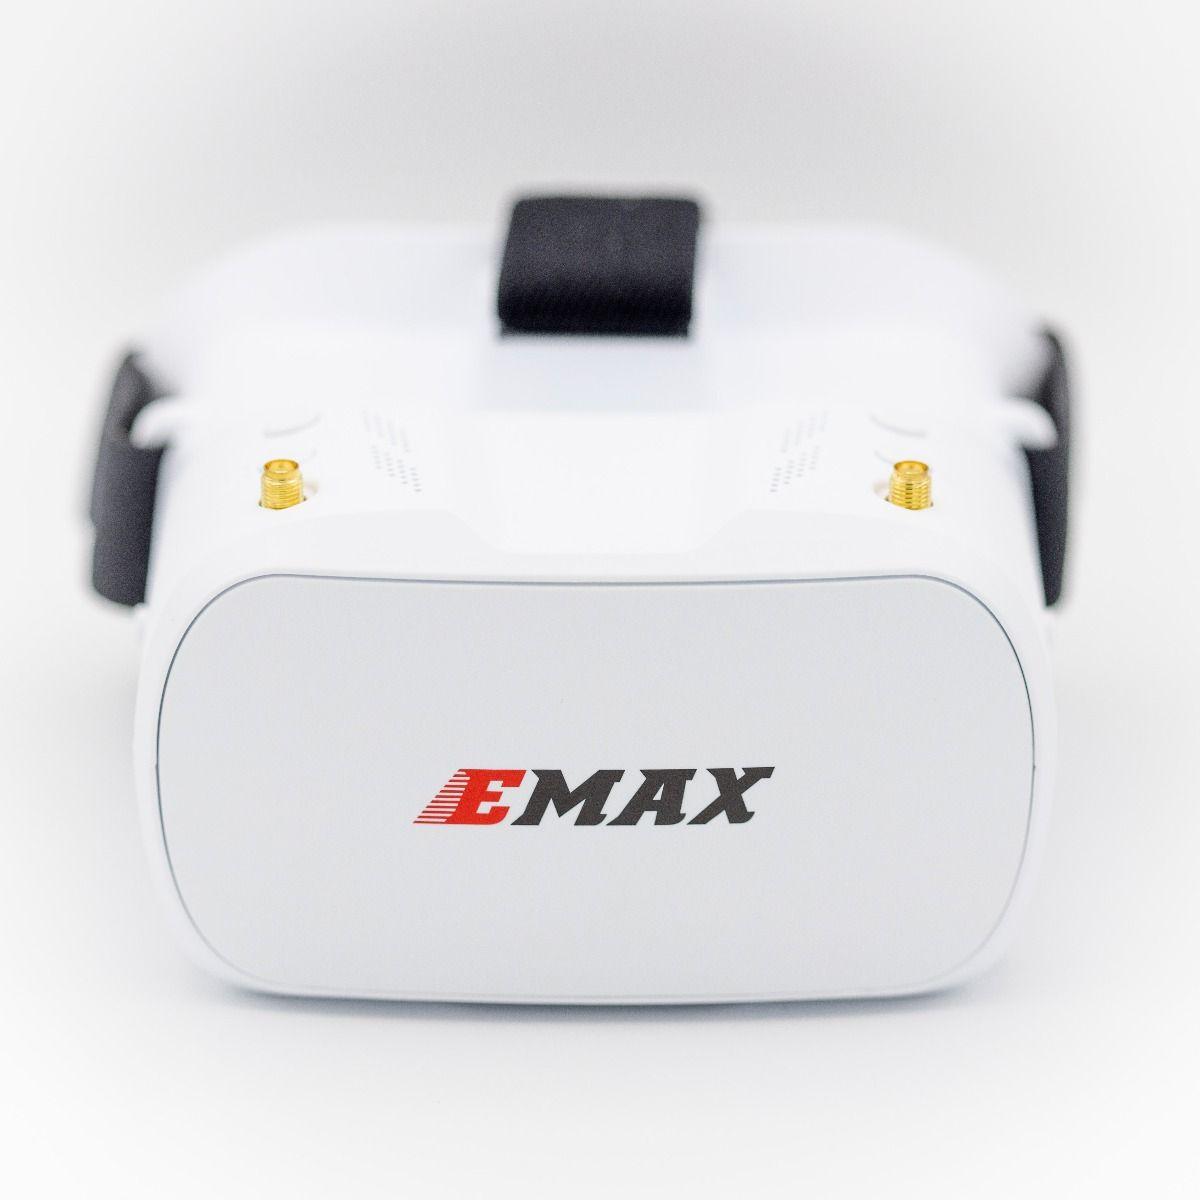 emax fpv transporter fpv goggles